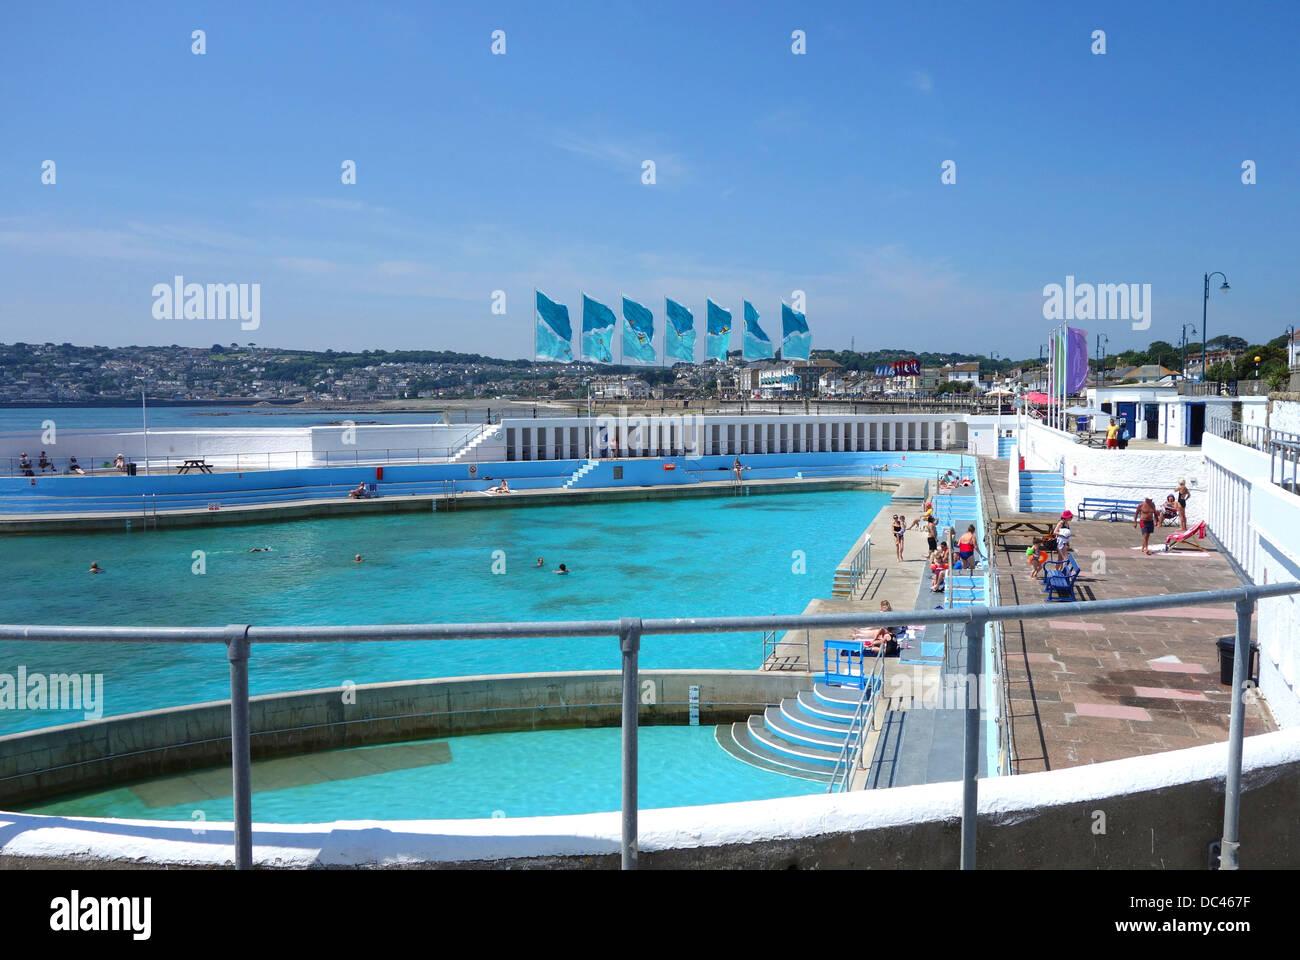 The Jubilee Pool In Penzance Cornwall Uk Stock Photo 59099699 Alamy